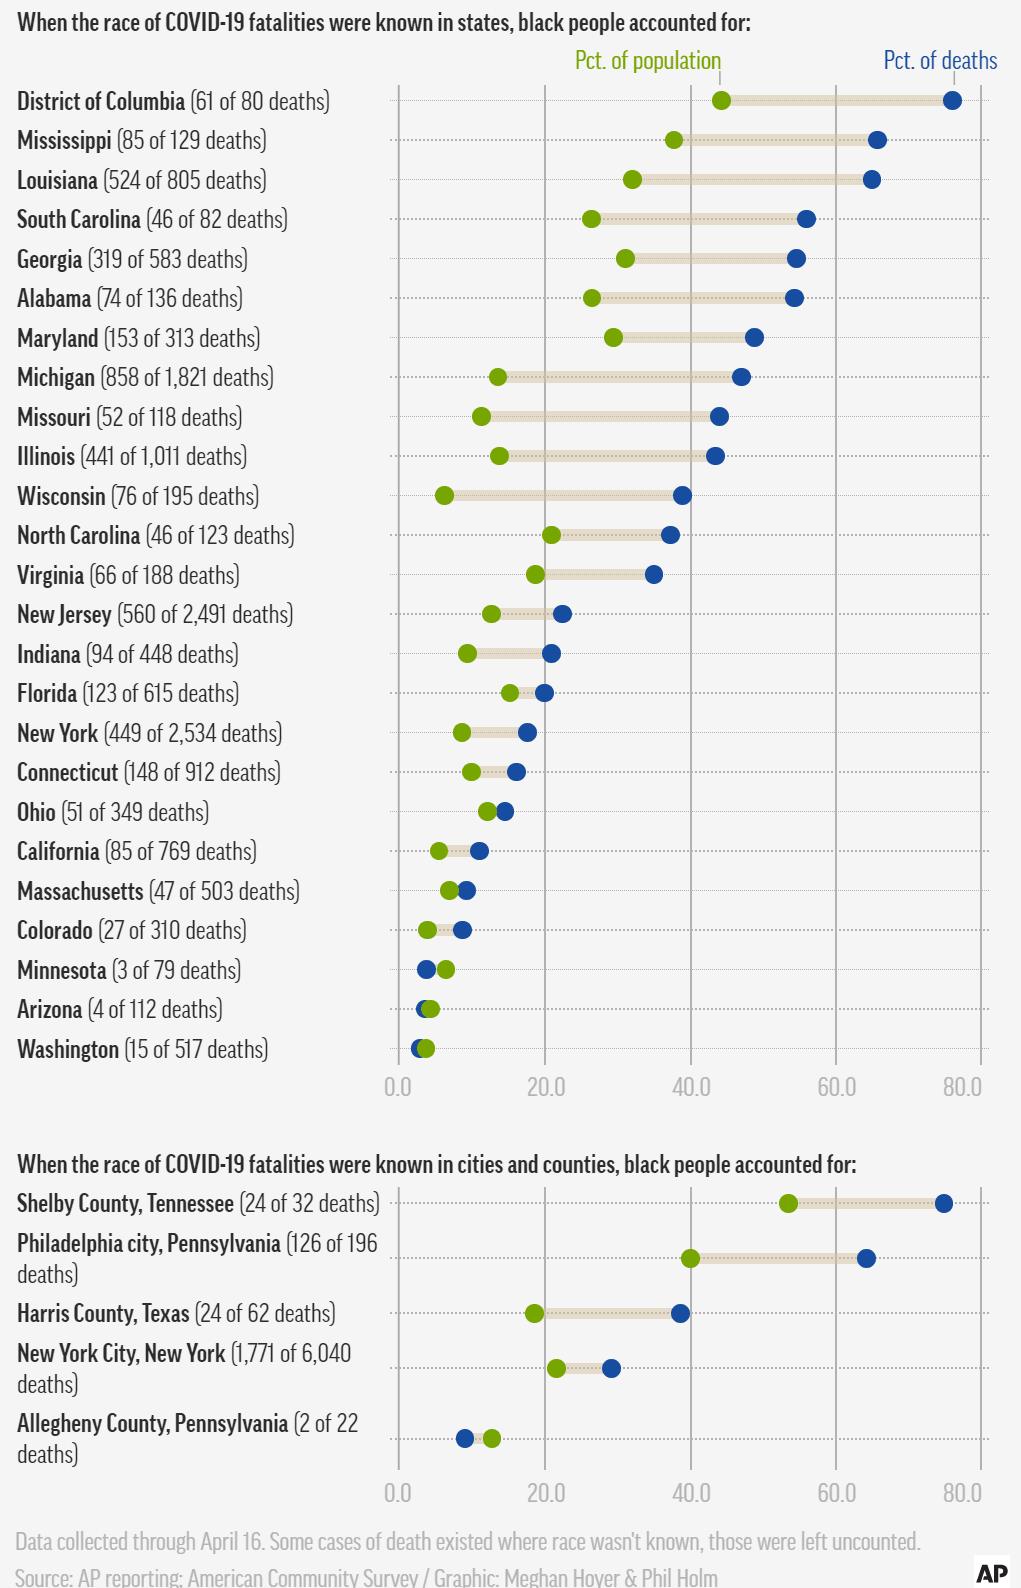 AP통신이 조사한 코로나19 사망 흑인의 비율 및 전체 인구 내 흑인 인구 비중 비교